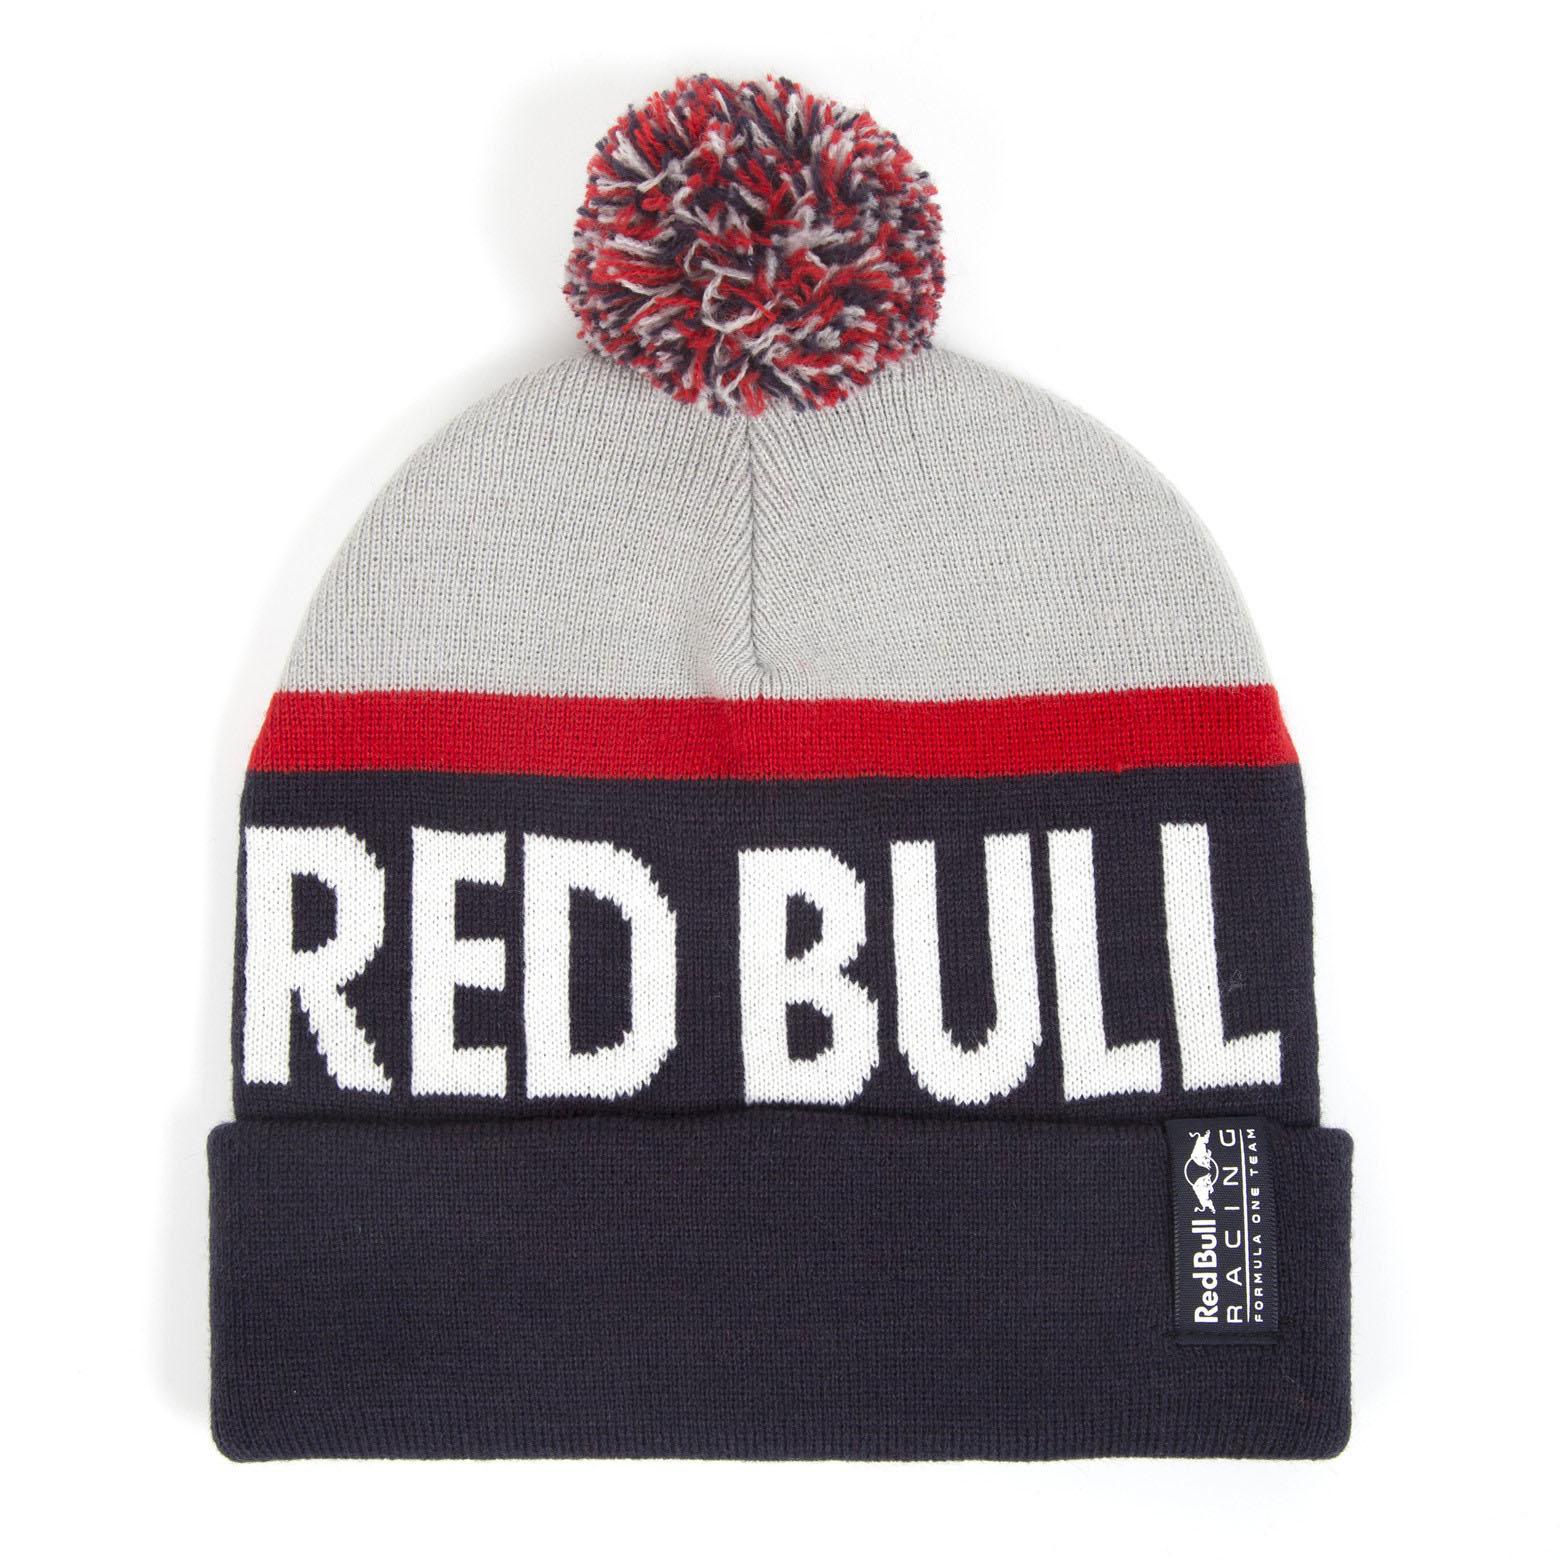 Sentinel 2018 Aston Martin Red Bull Racing F1 Team Beanie Knitted Winter Hat  Adult Size 543f8f00f42